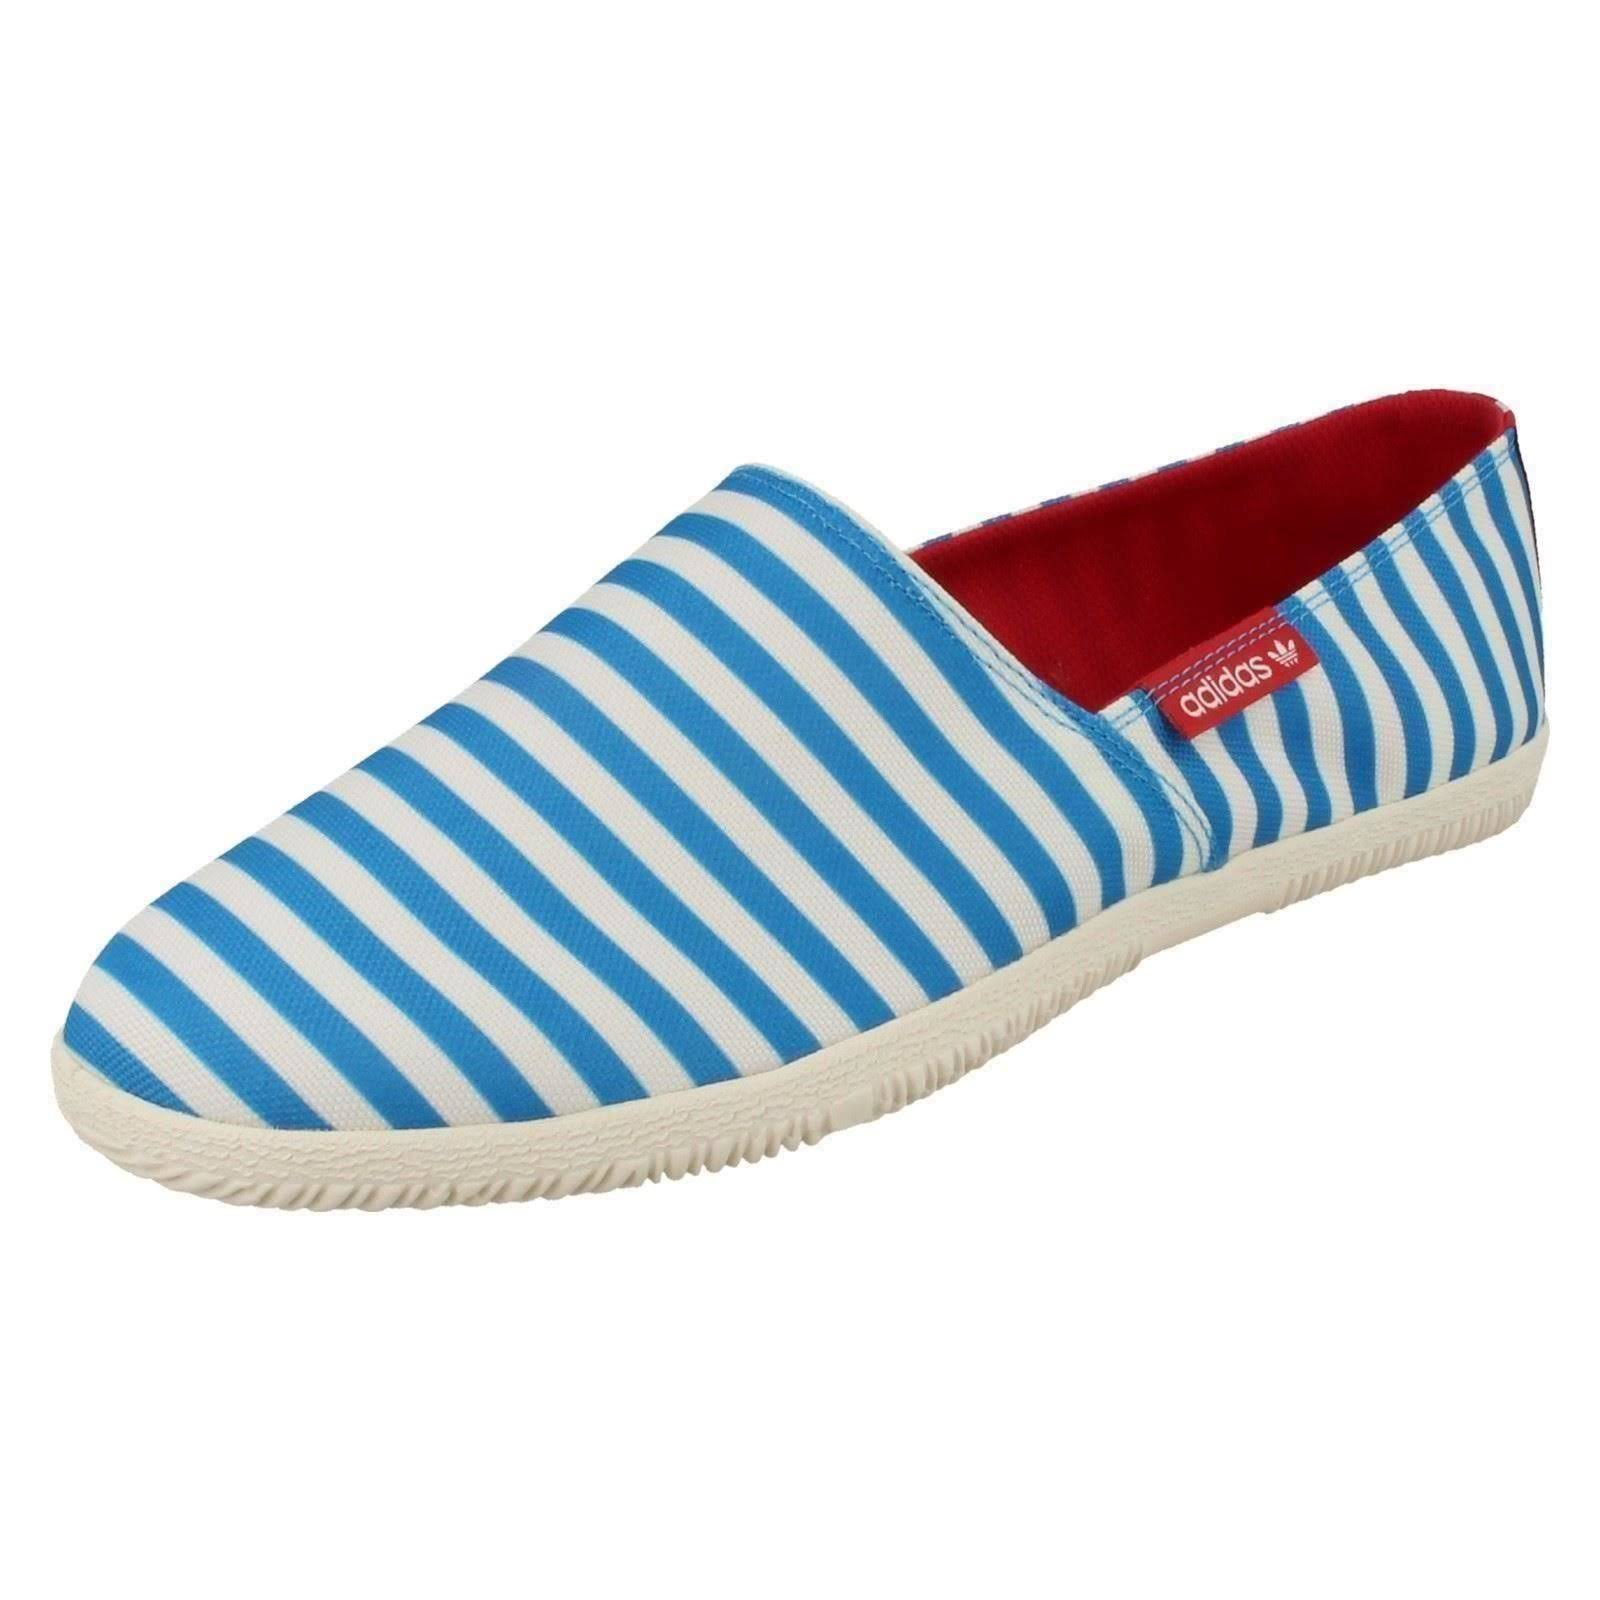 (UK 9.5, Solblu/Whtvap/Redbea (Multi)) Mens Adidas Canvas Pumps Adidrill